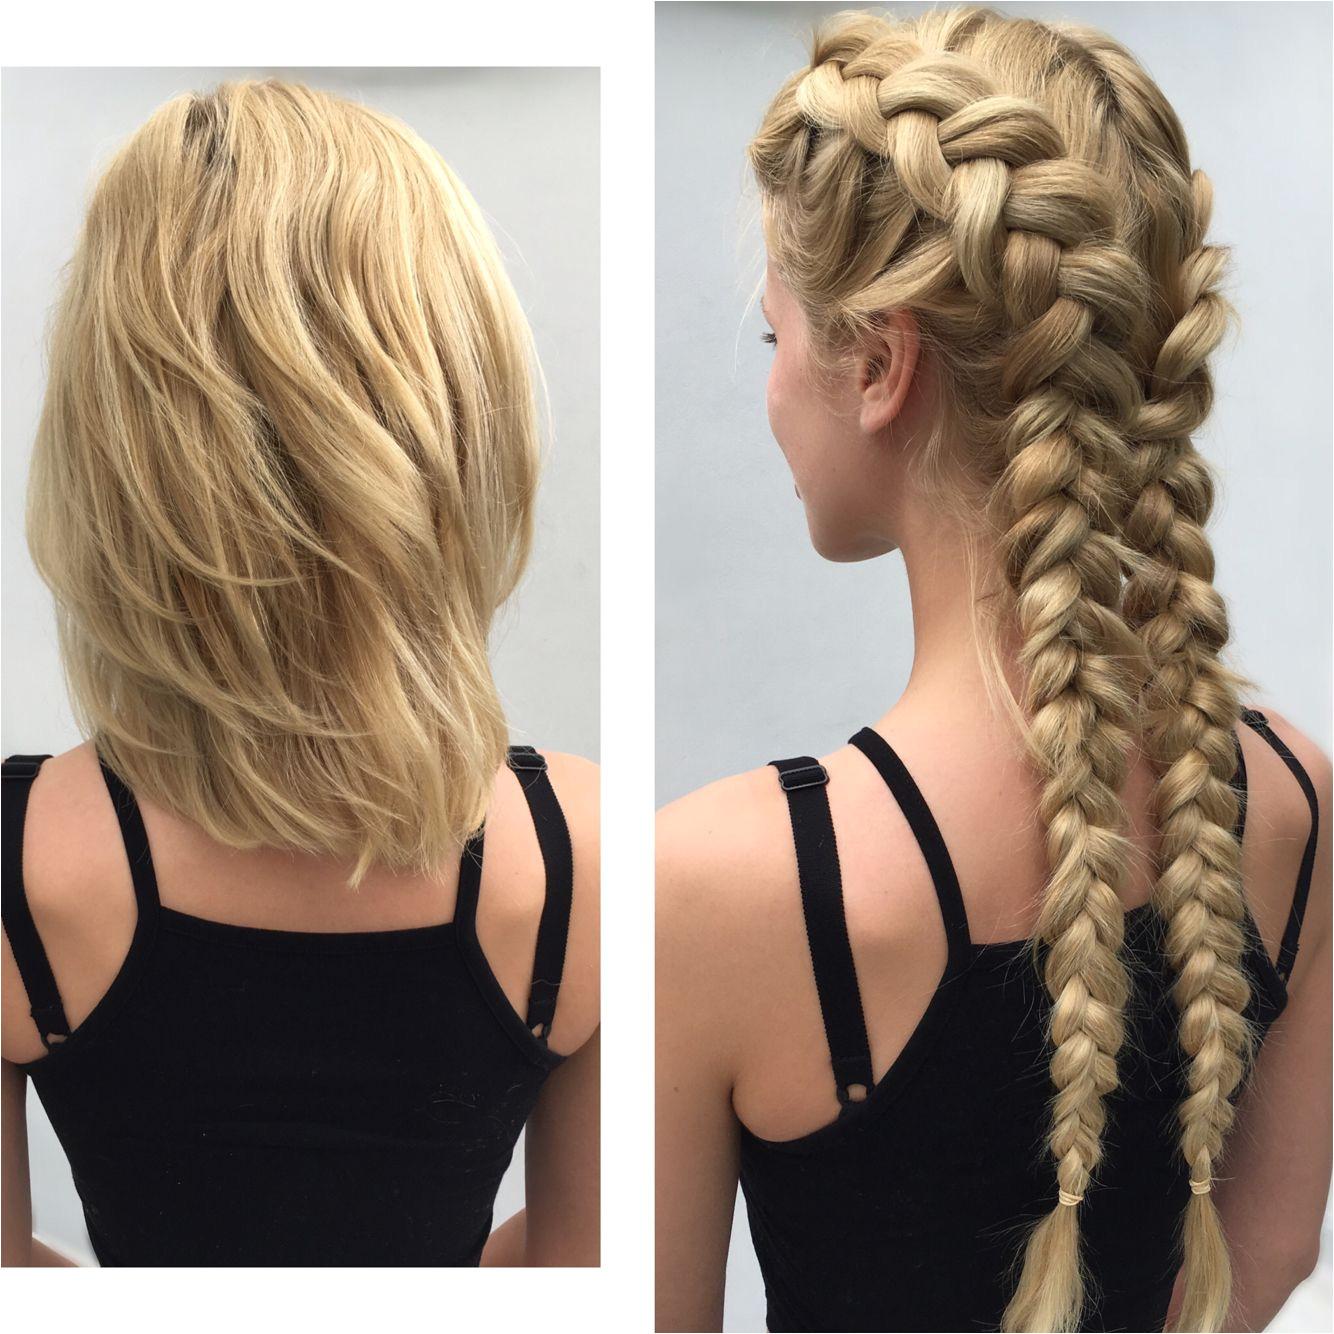 Boxer braids clip in braids hair extensions by tatiana Karelina